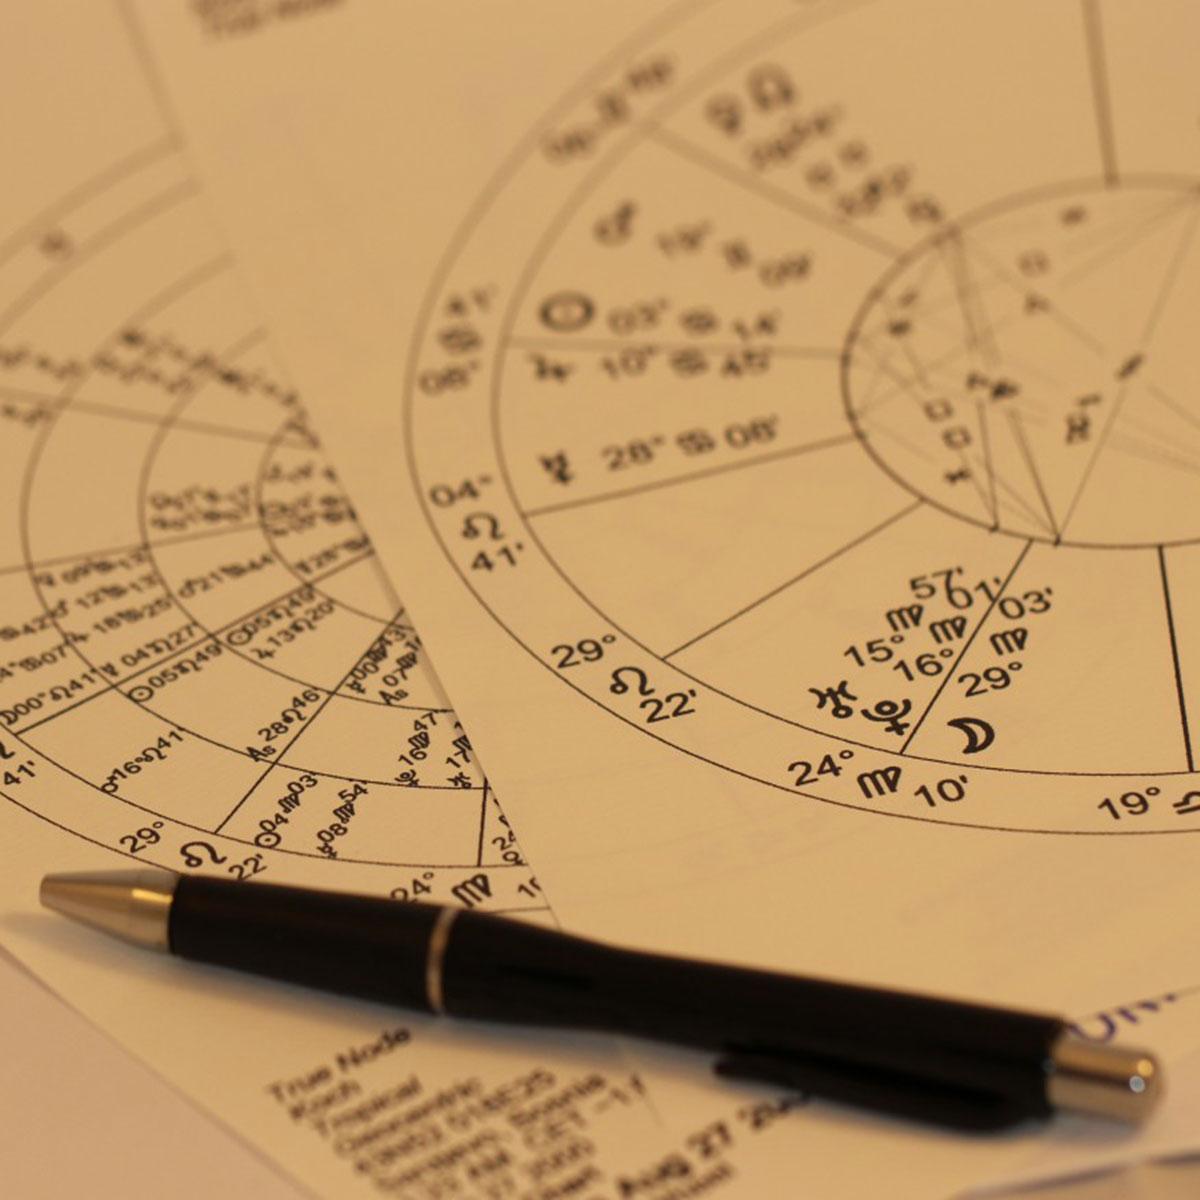 astro vest planet horo - Planeters betydning - Vestlig astrologi